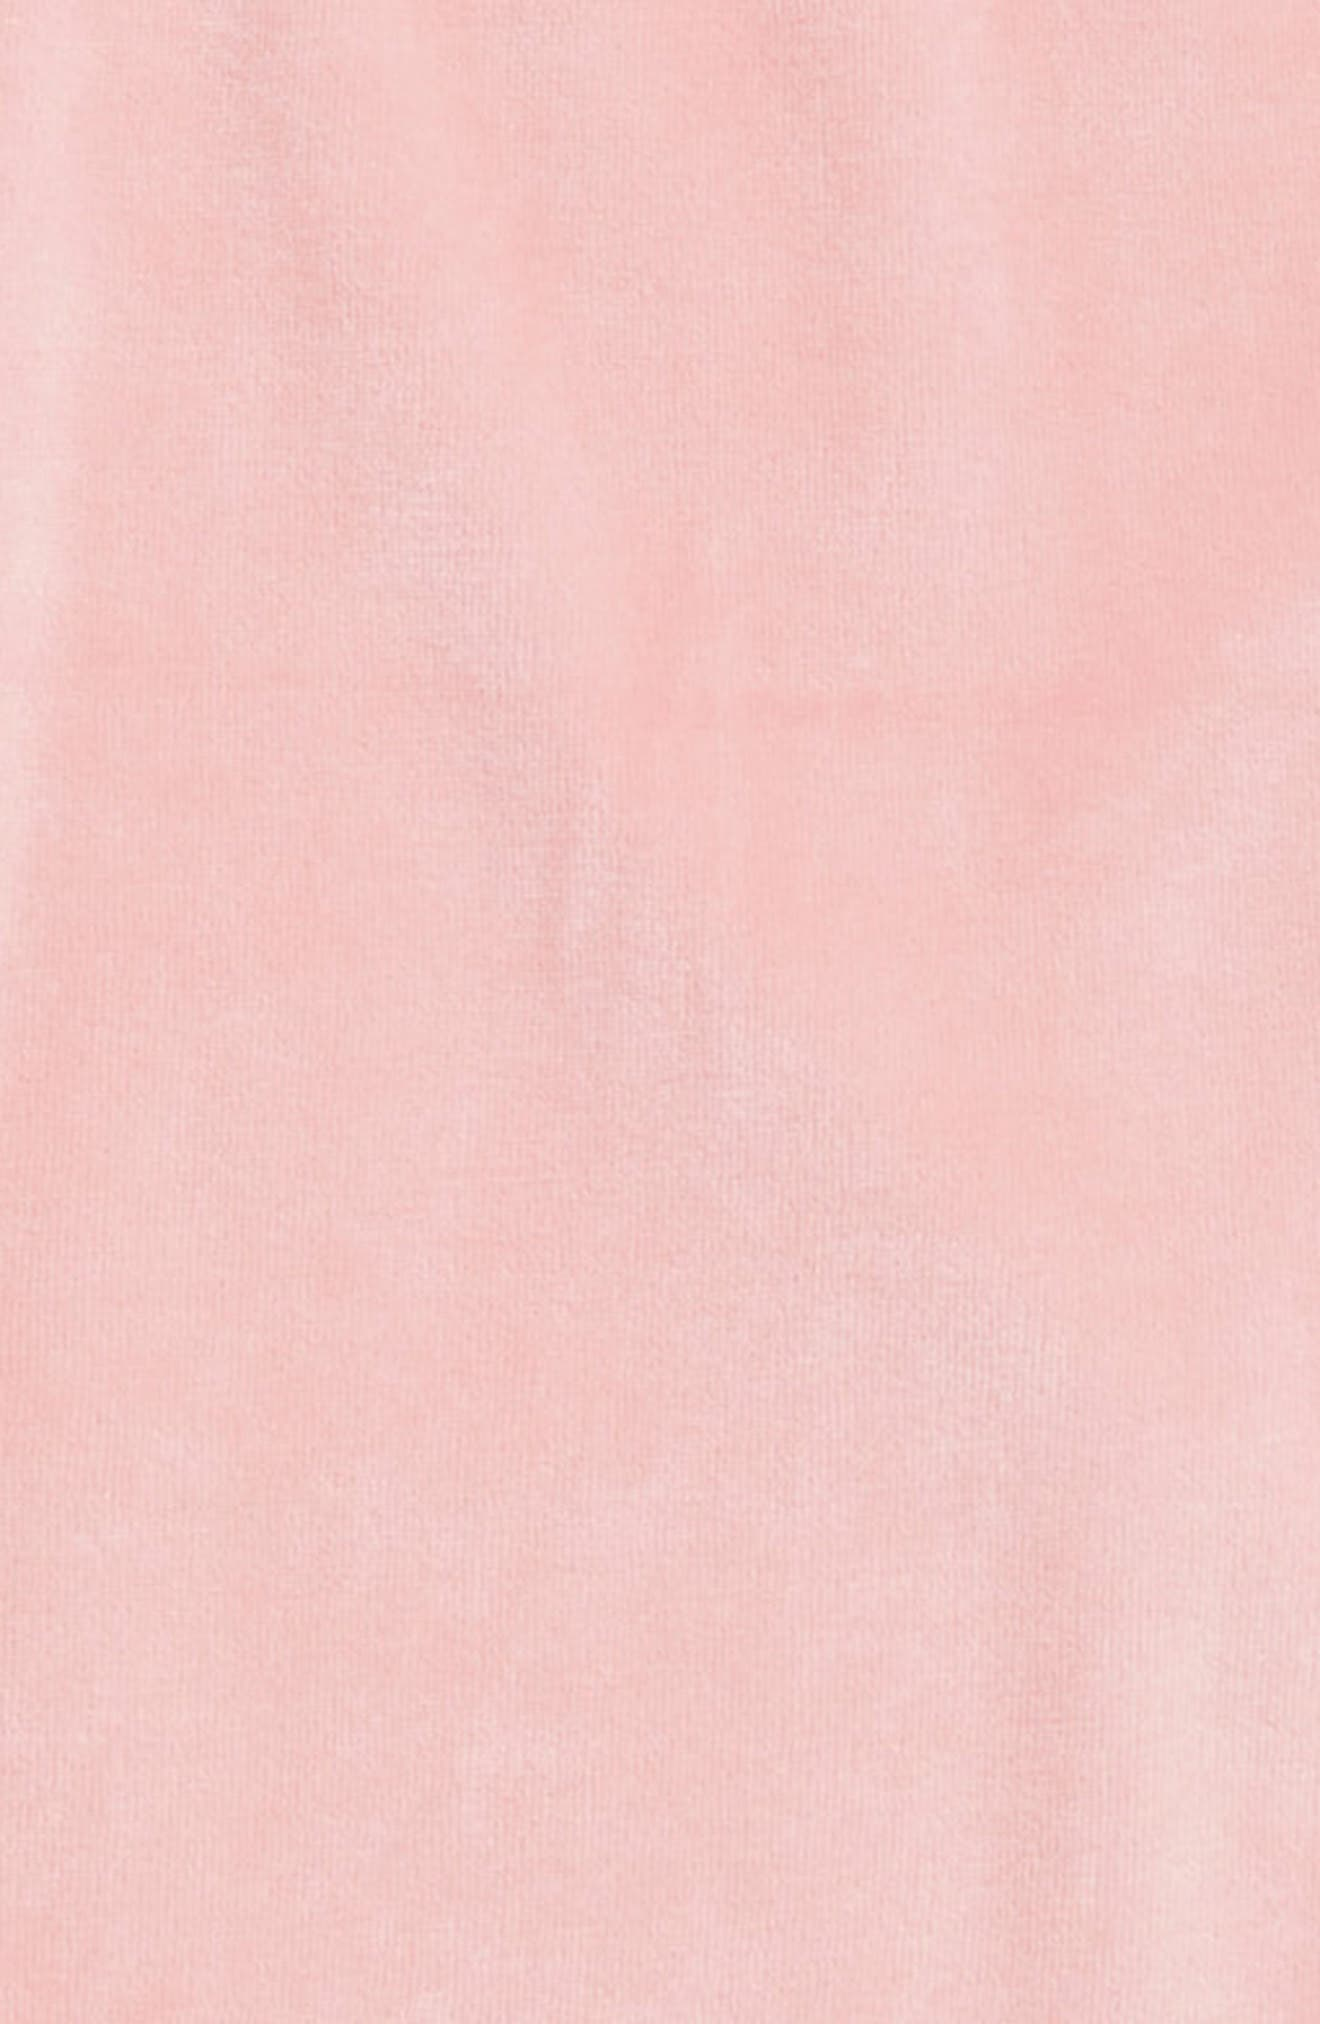 Velour Side Slit Sweatshirt,                             Alternate thumbnail 2, color,                             630